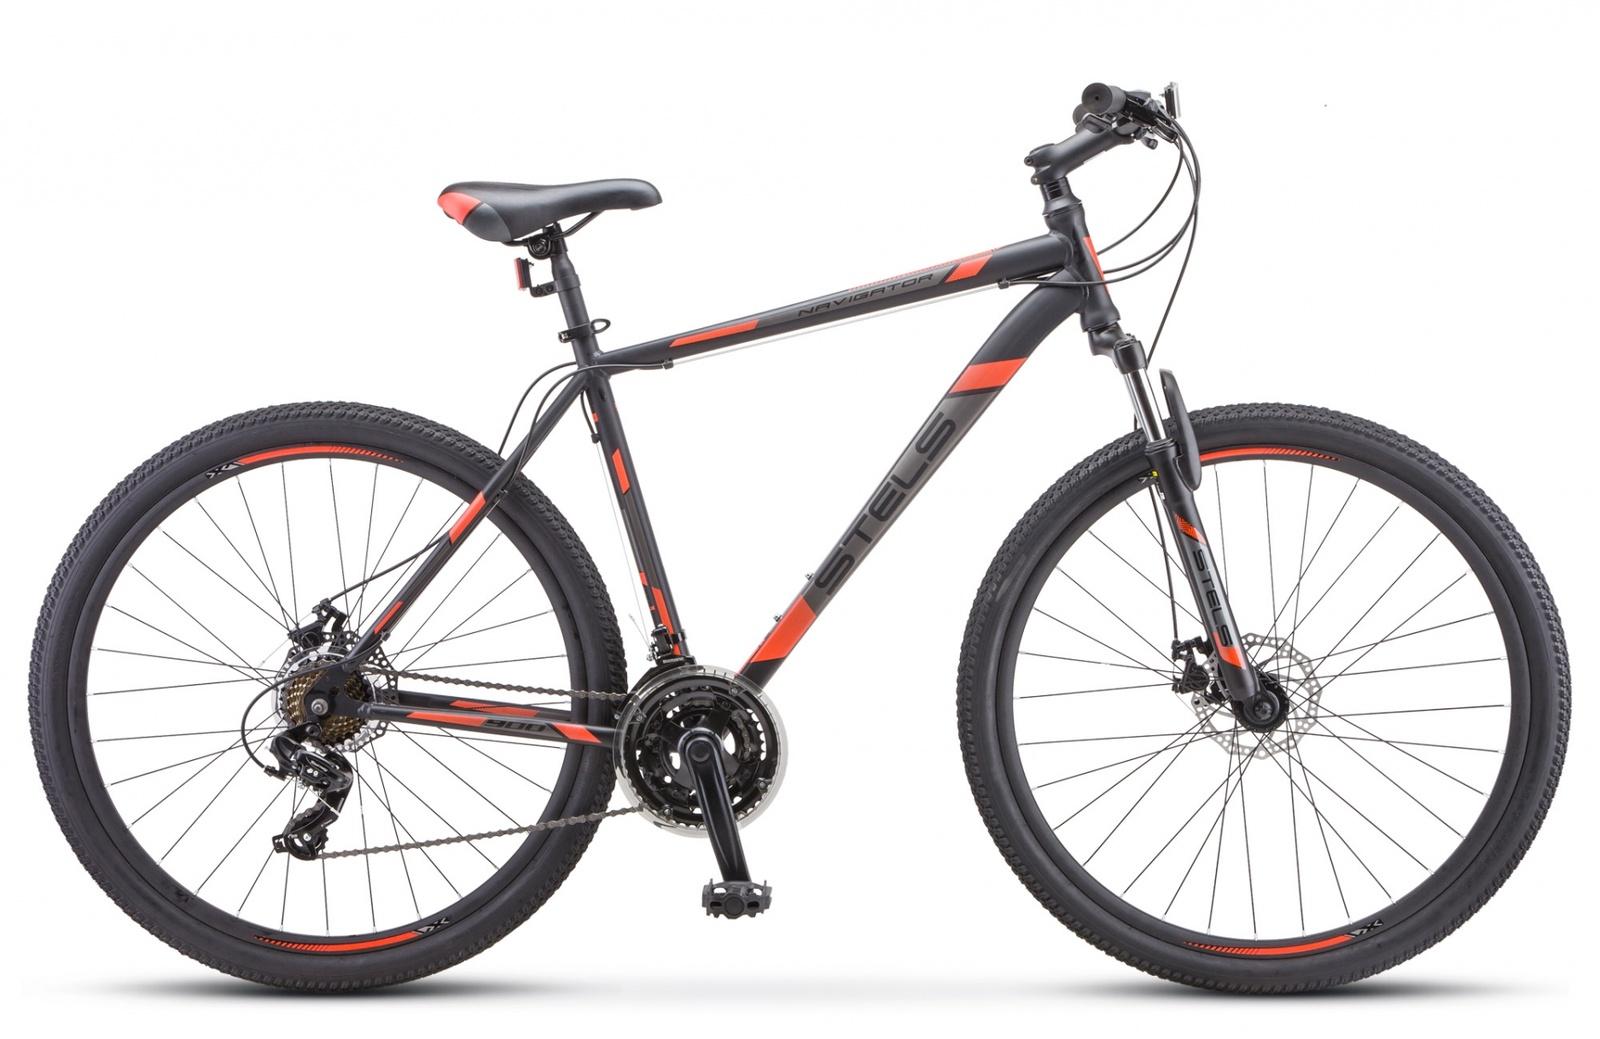 Велосипед Navigator 900 MD 29 F010 (2019), рама 21 дюйм